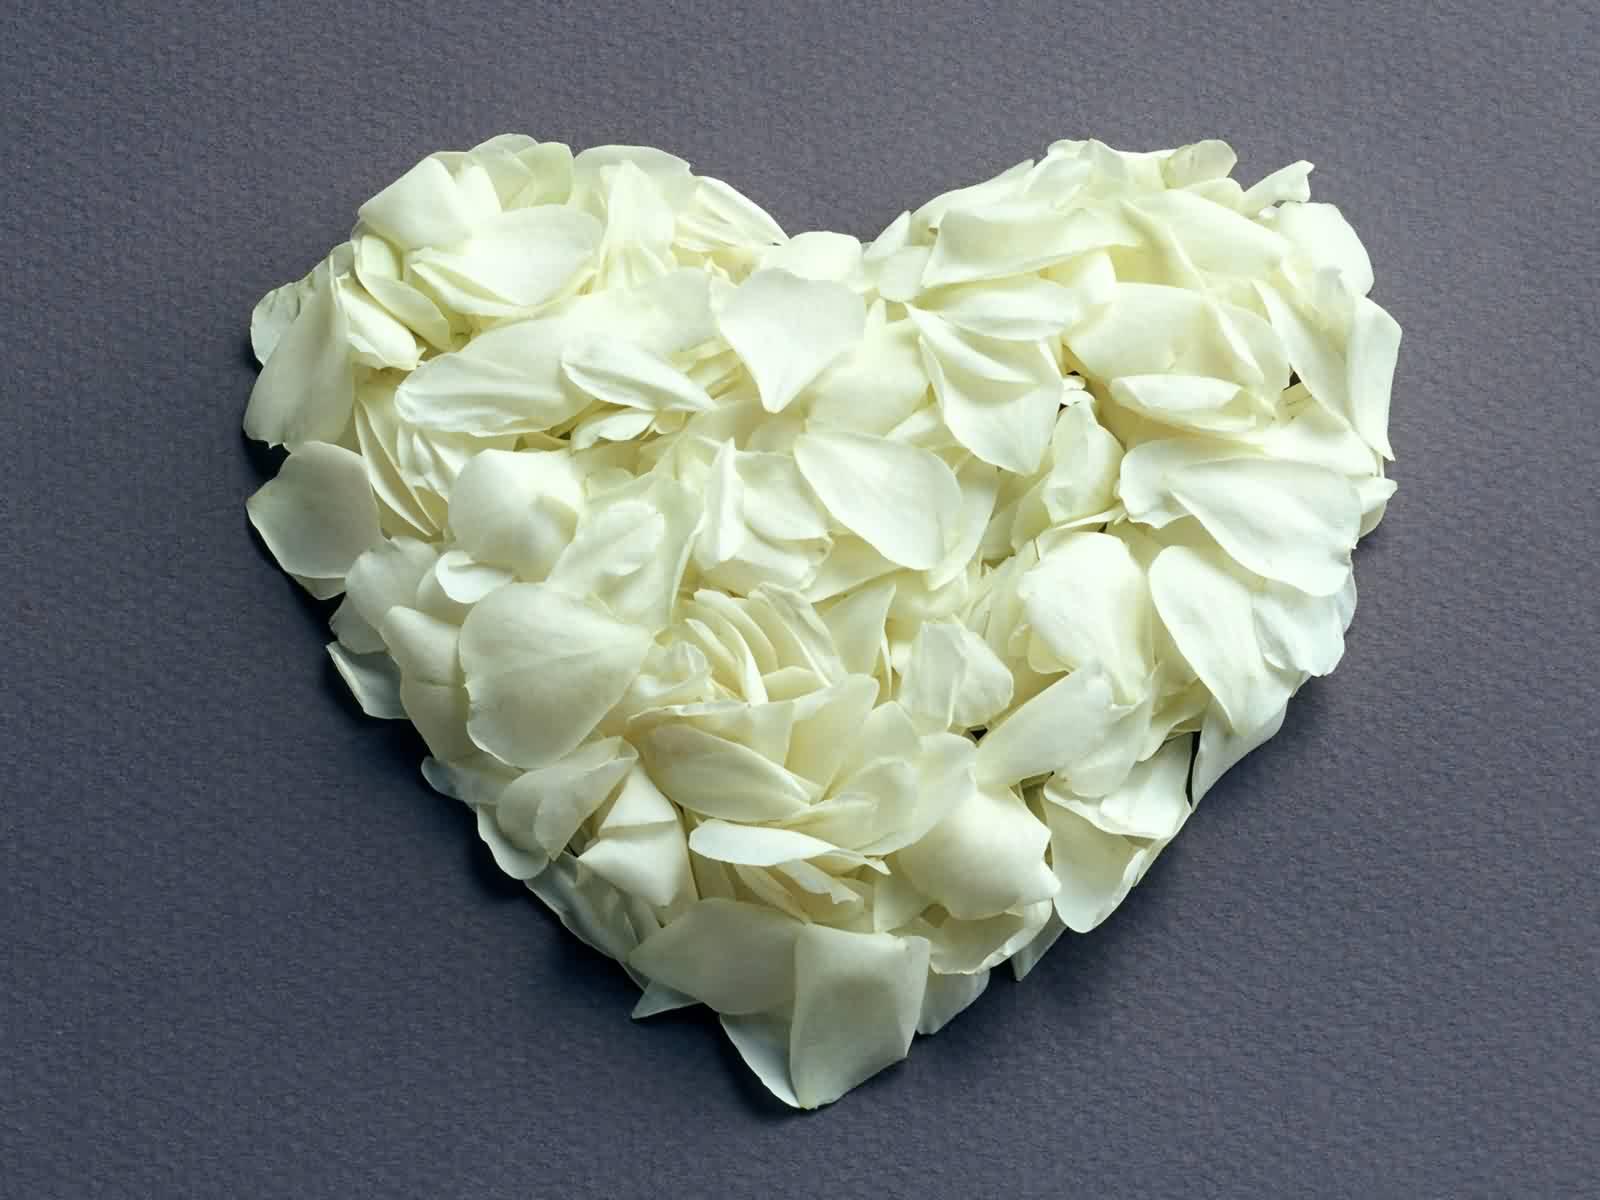 white rose flowers - photo #17